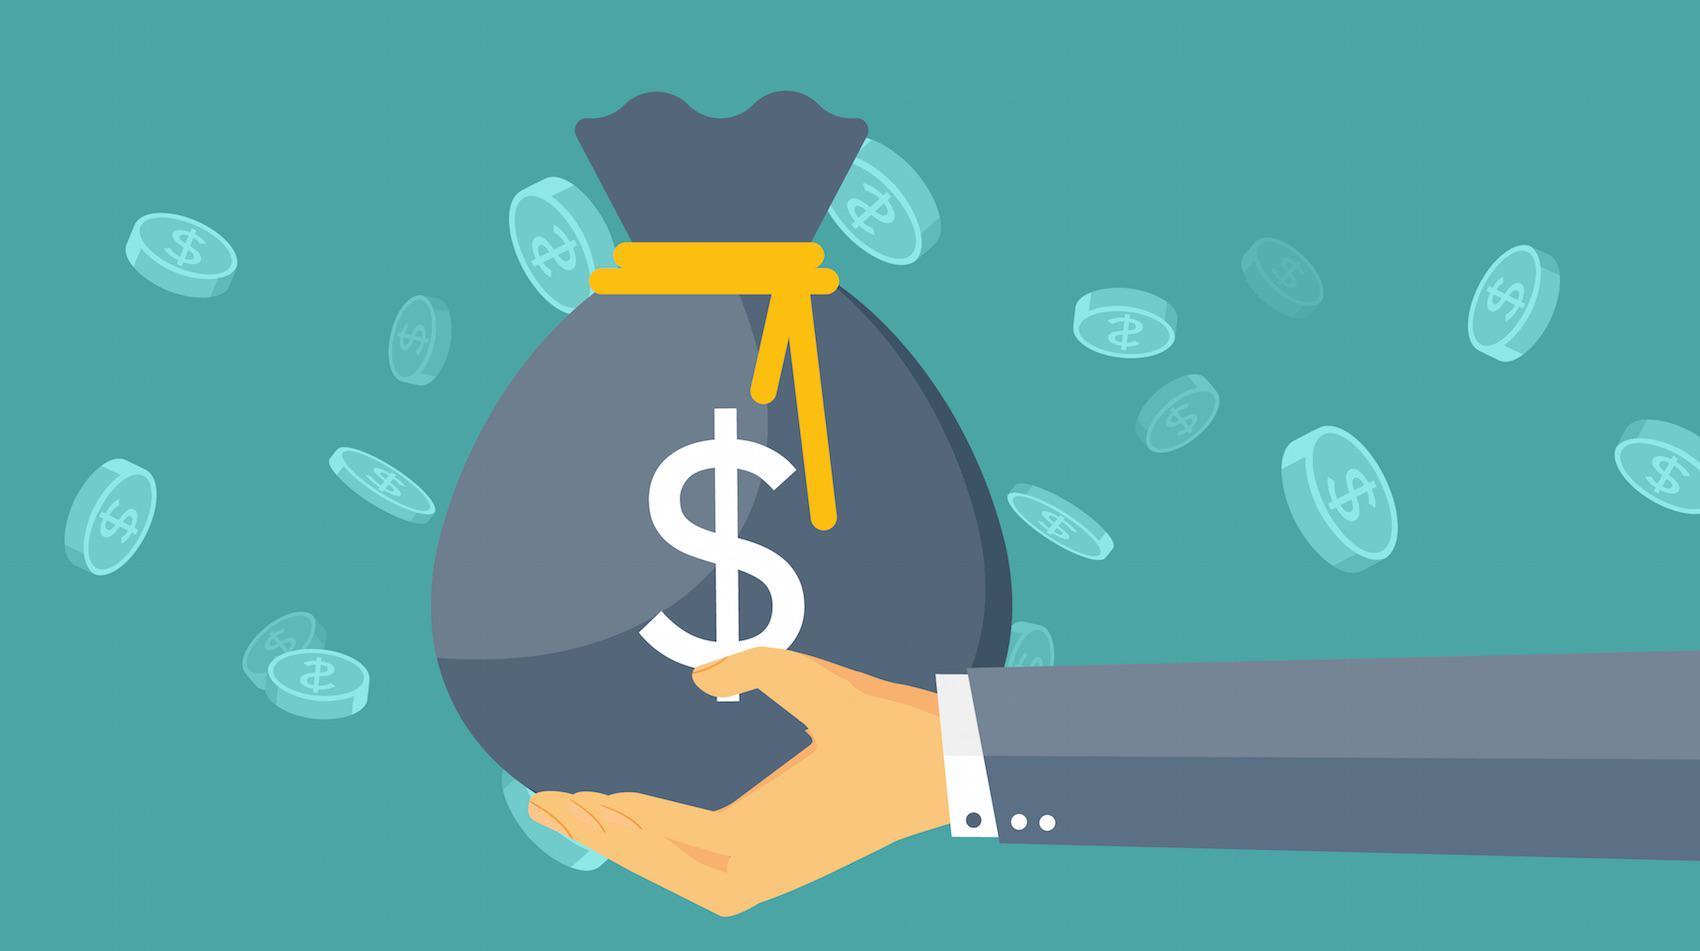 RT @TheNextWeb: How to take your app and turn it into cash money http://t.co/l62HD4Kbjc http://t.co/AqEnn2dNbG